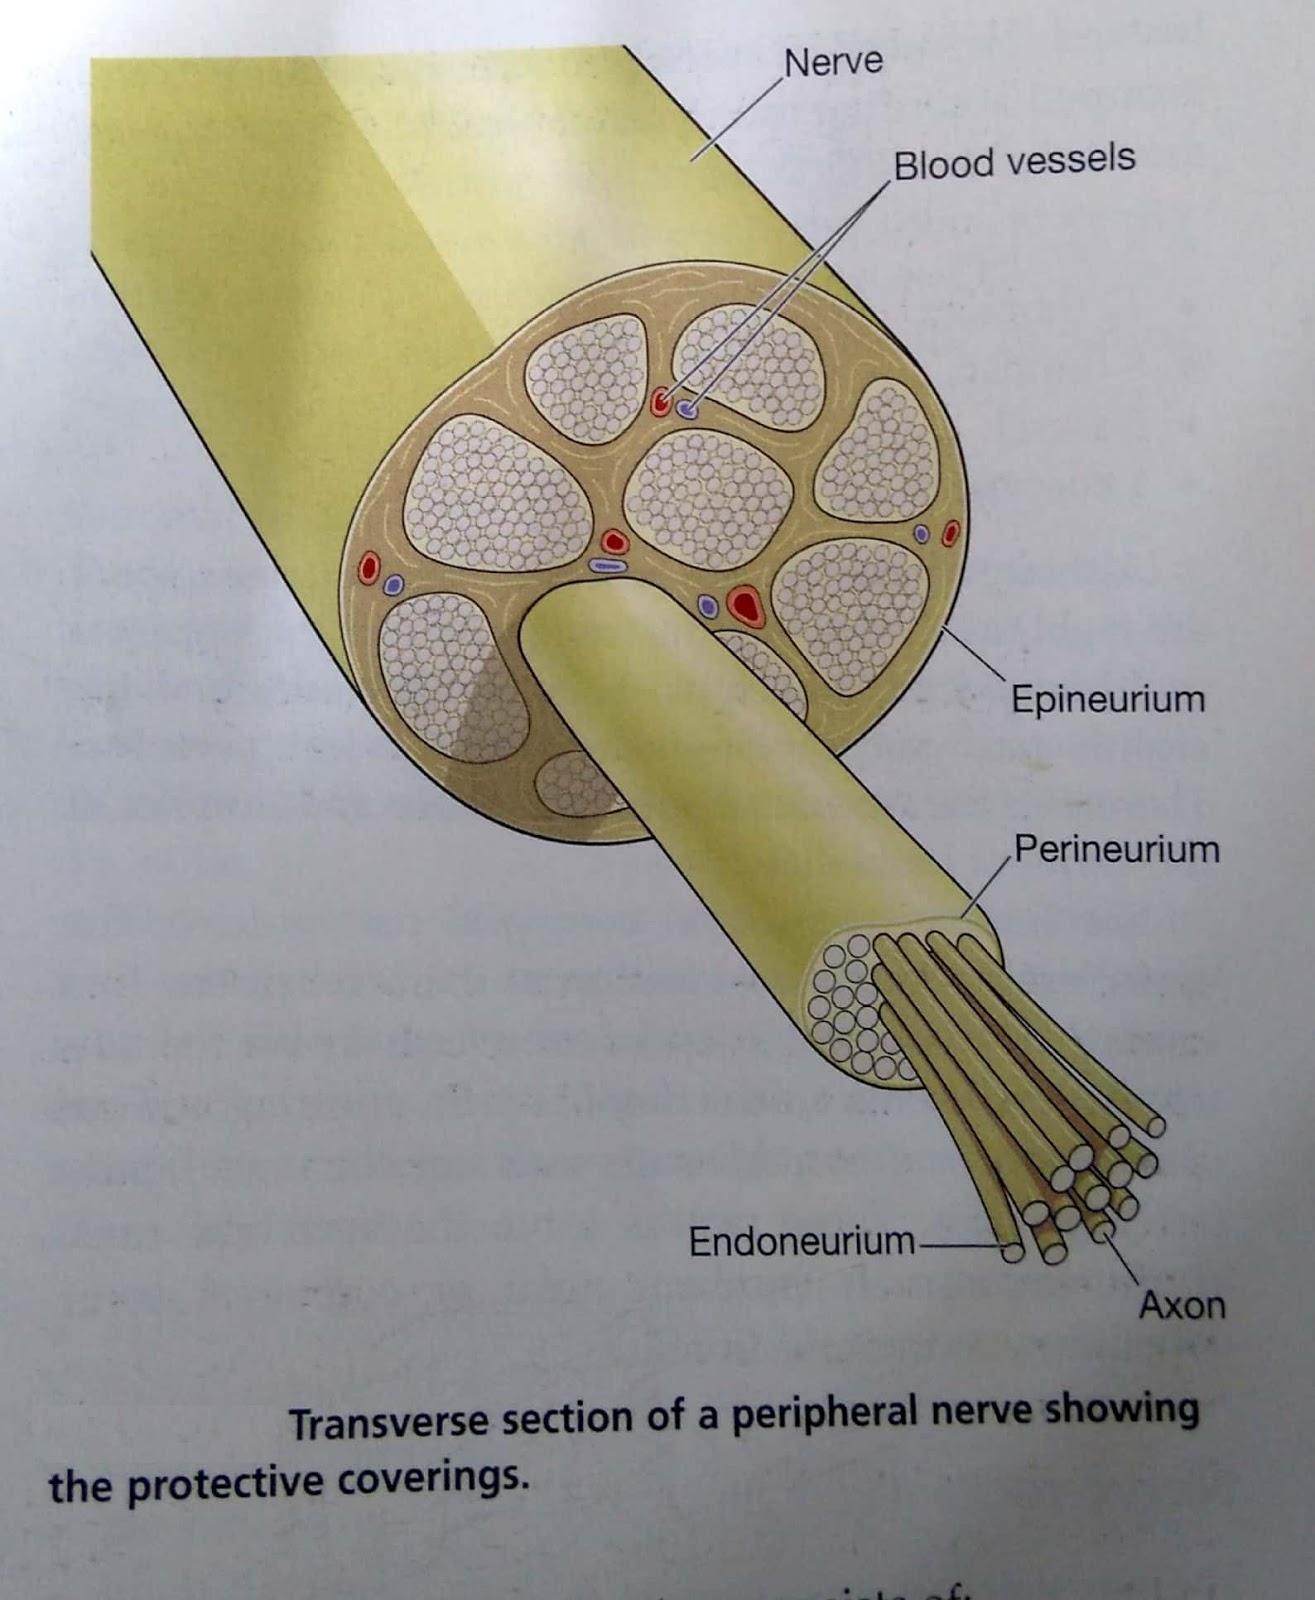 Human Anatomy Peripheral Nervous System